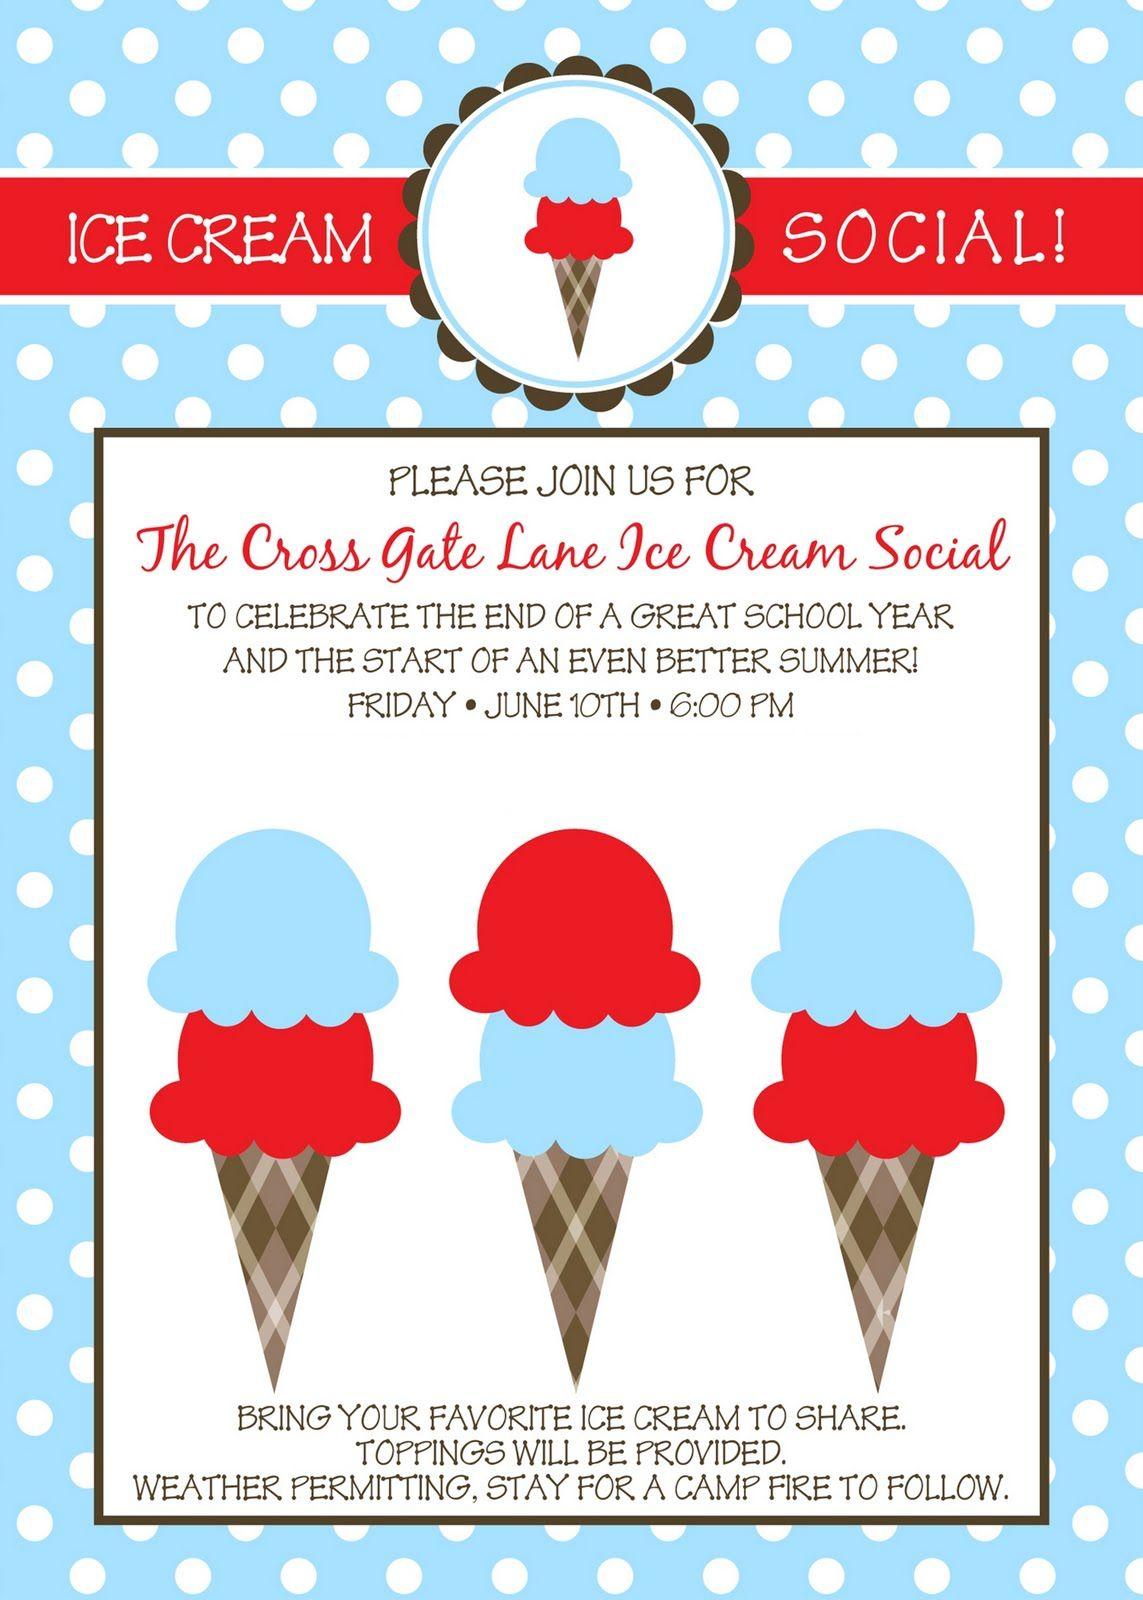 Dorable Ice Cream Party Invite Motif - Resume Ideas - megansmission.info